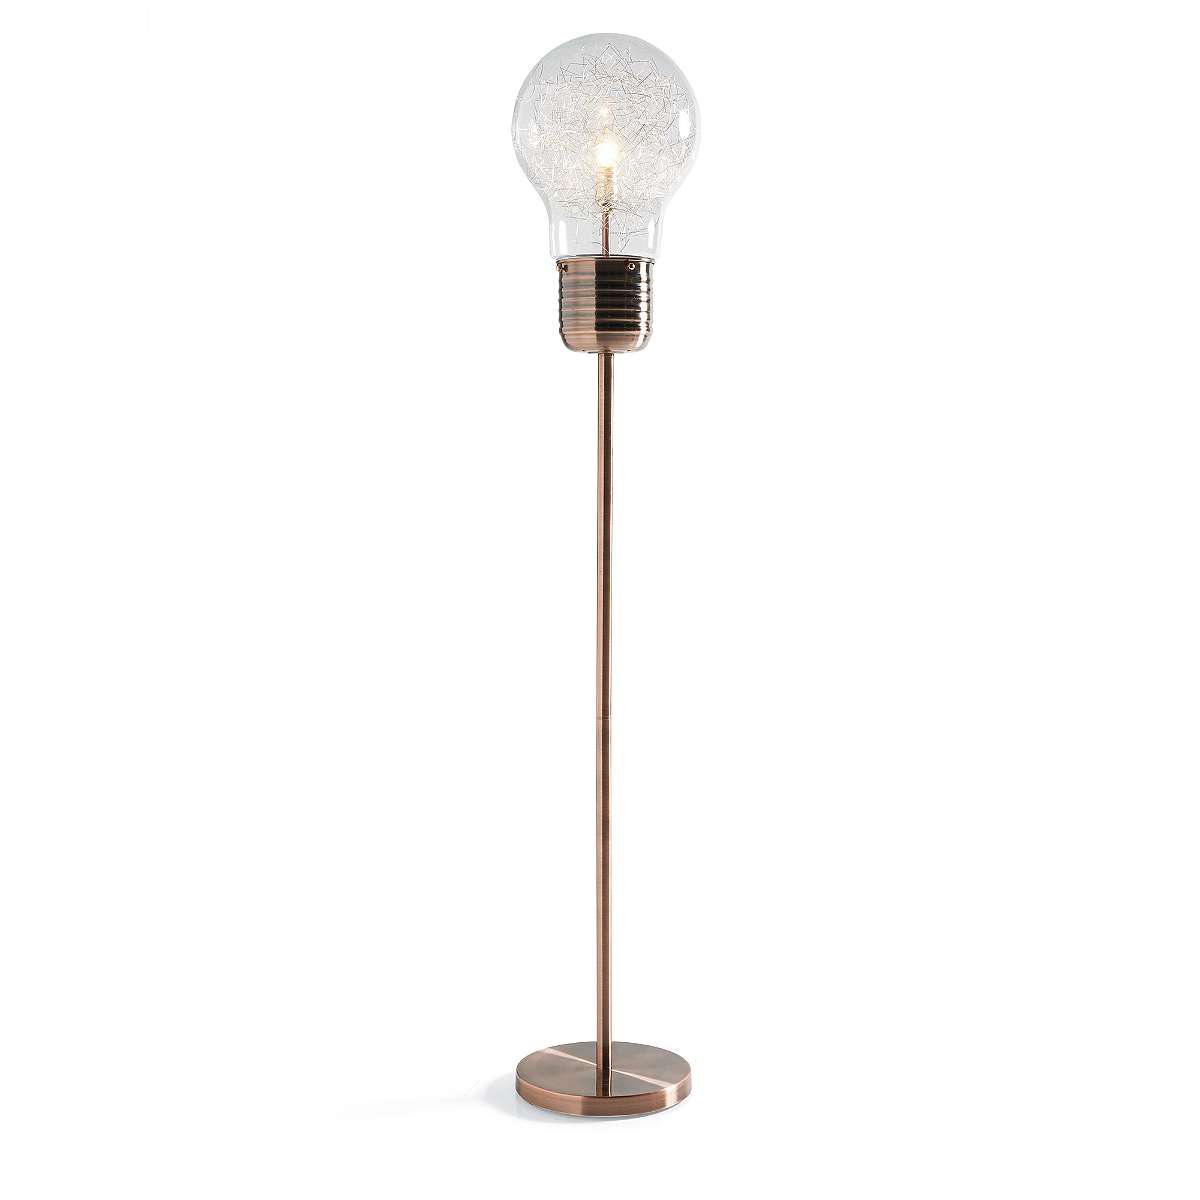 Edison Light Bulb Table Lamp